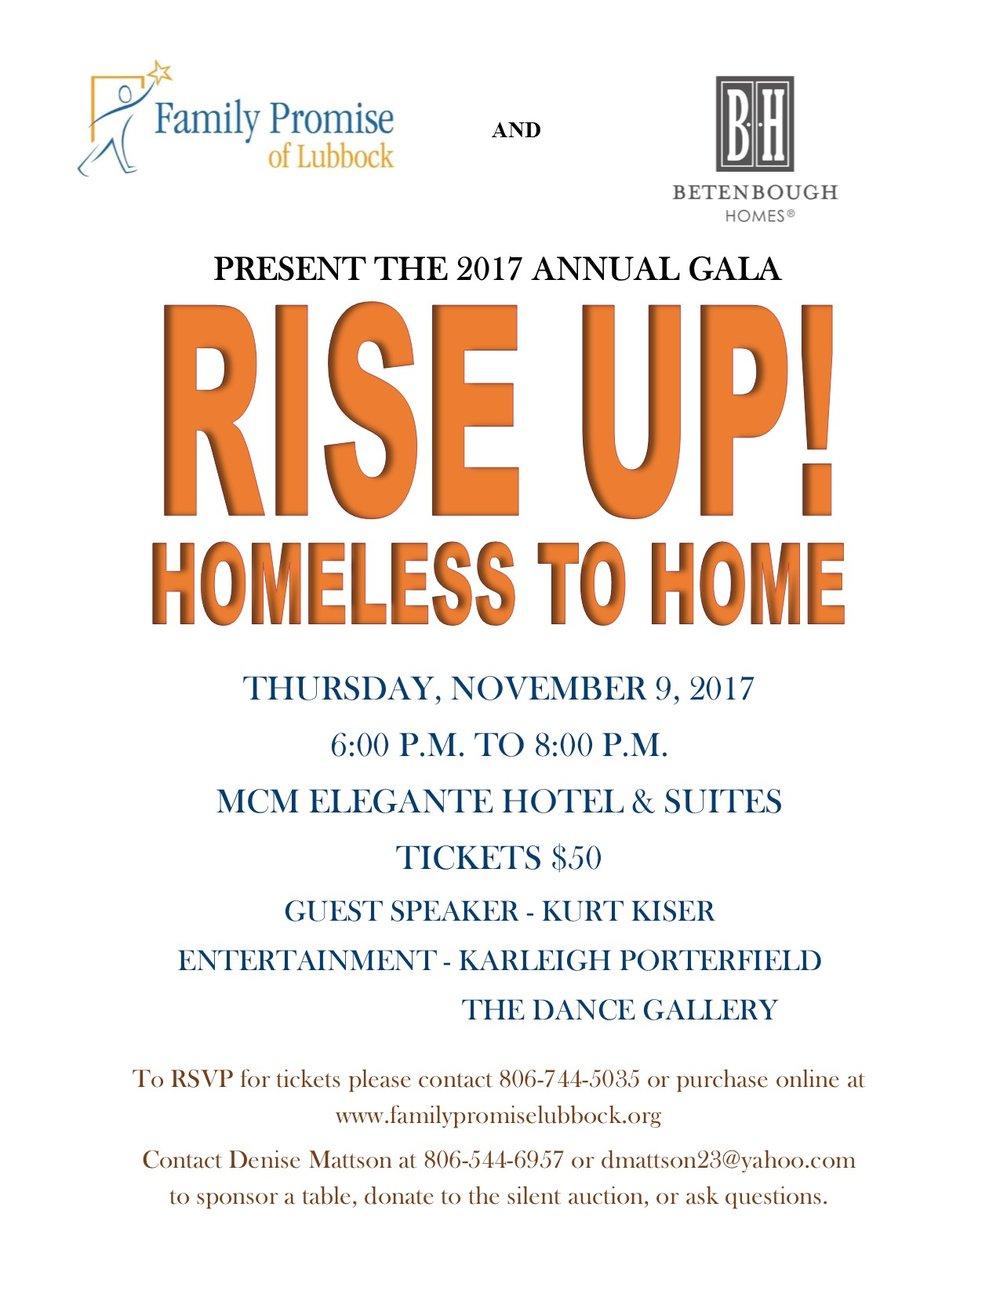 Sep 2017 Gala Poster.jpg